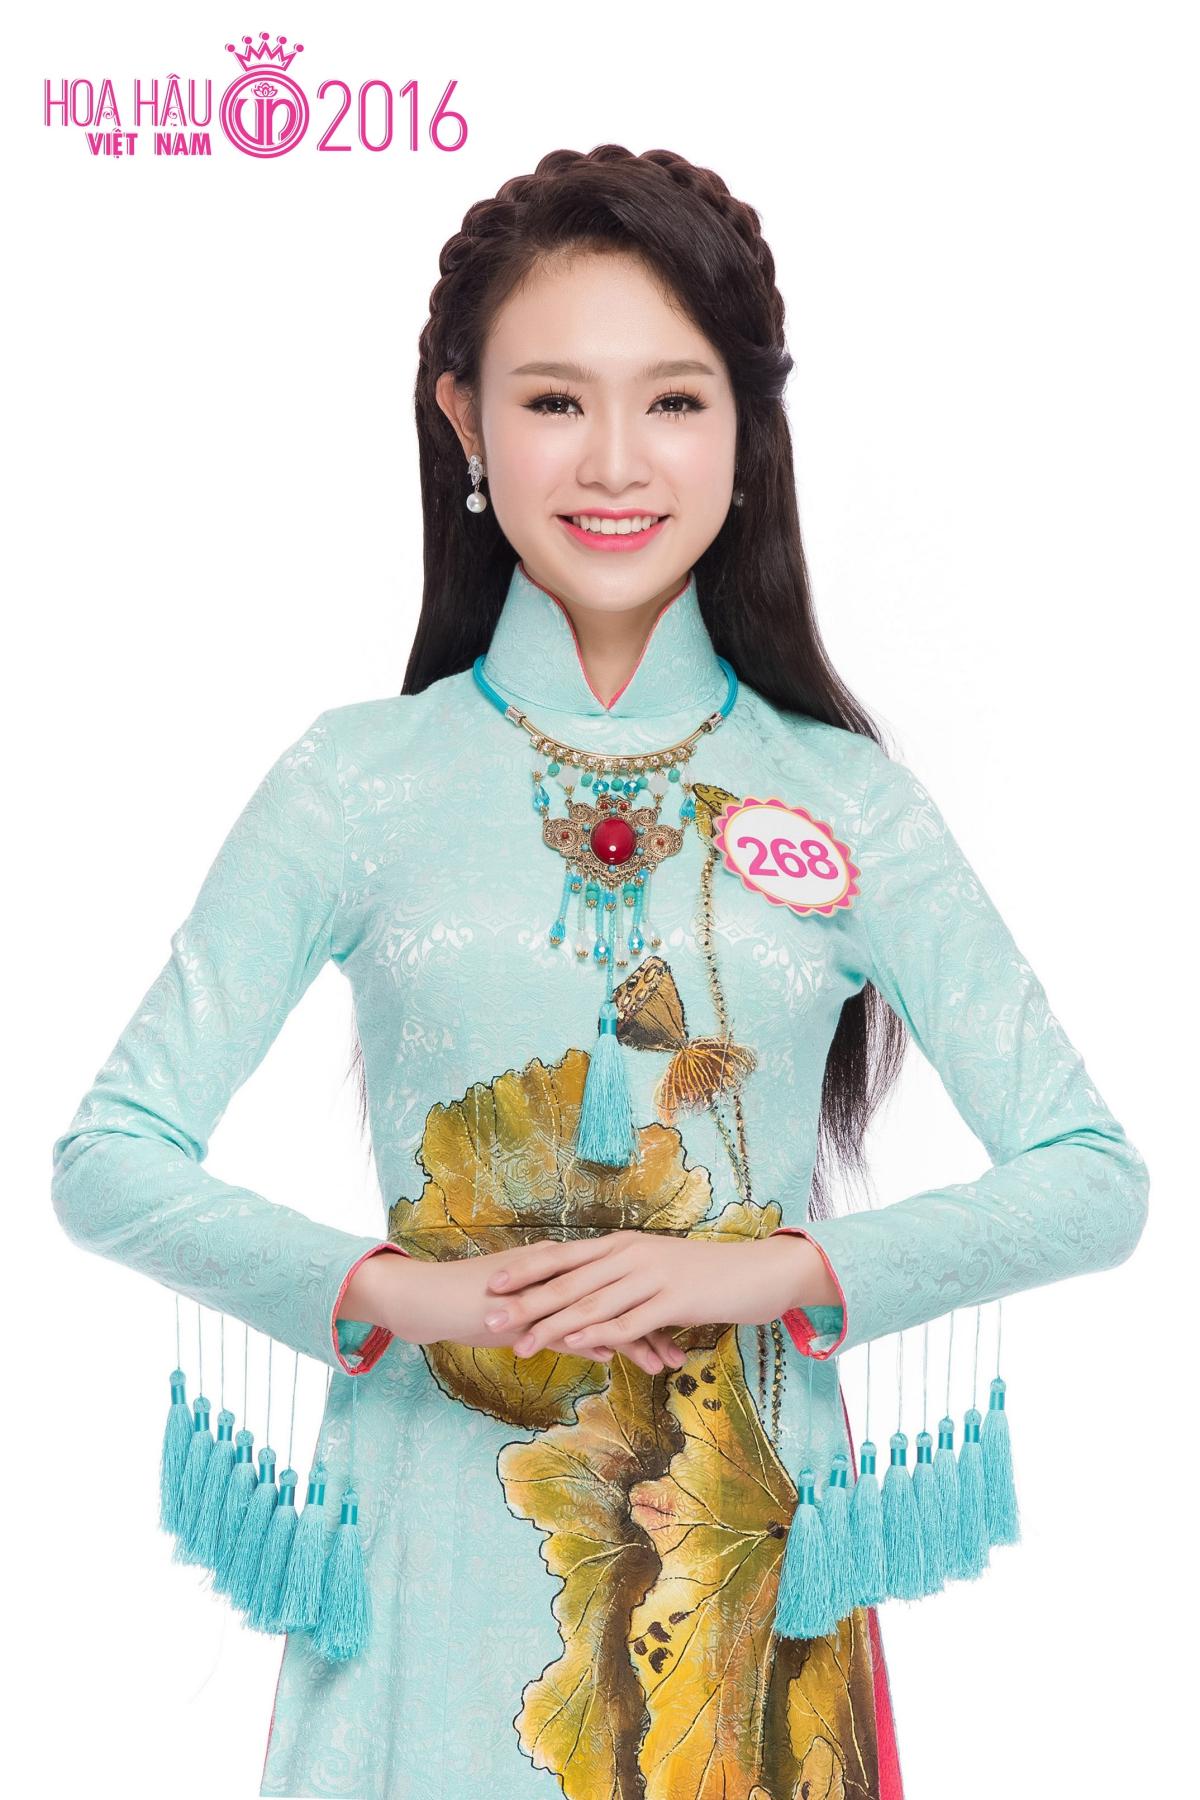 268 - Phung Bao Ngoc Van 2